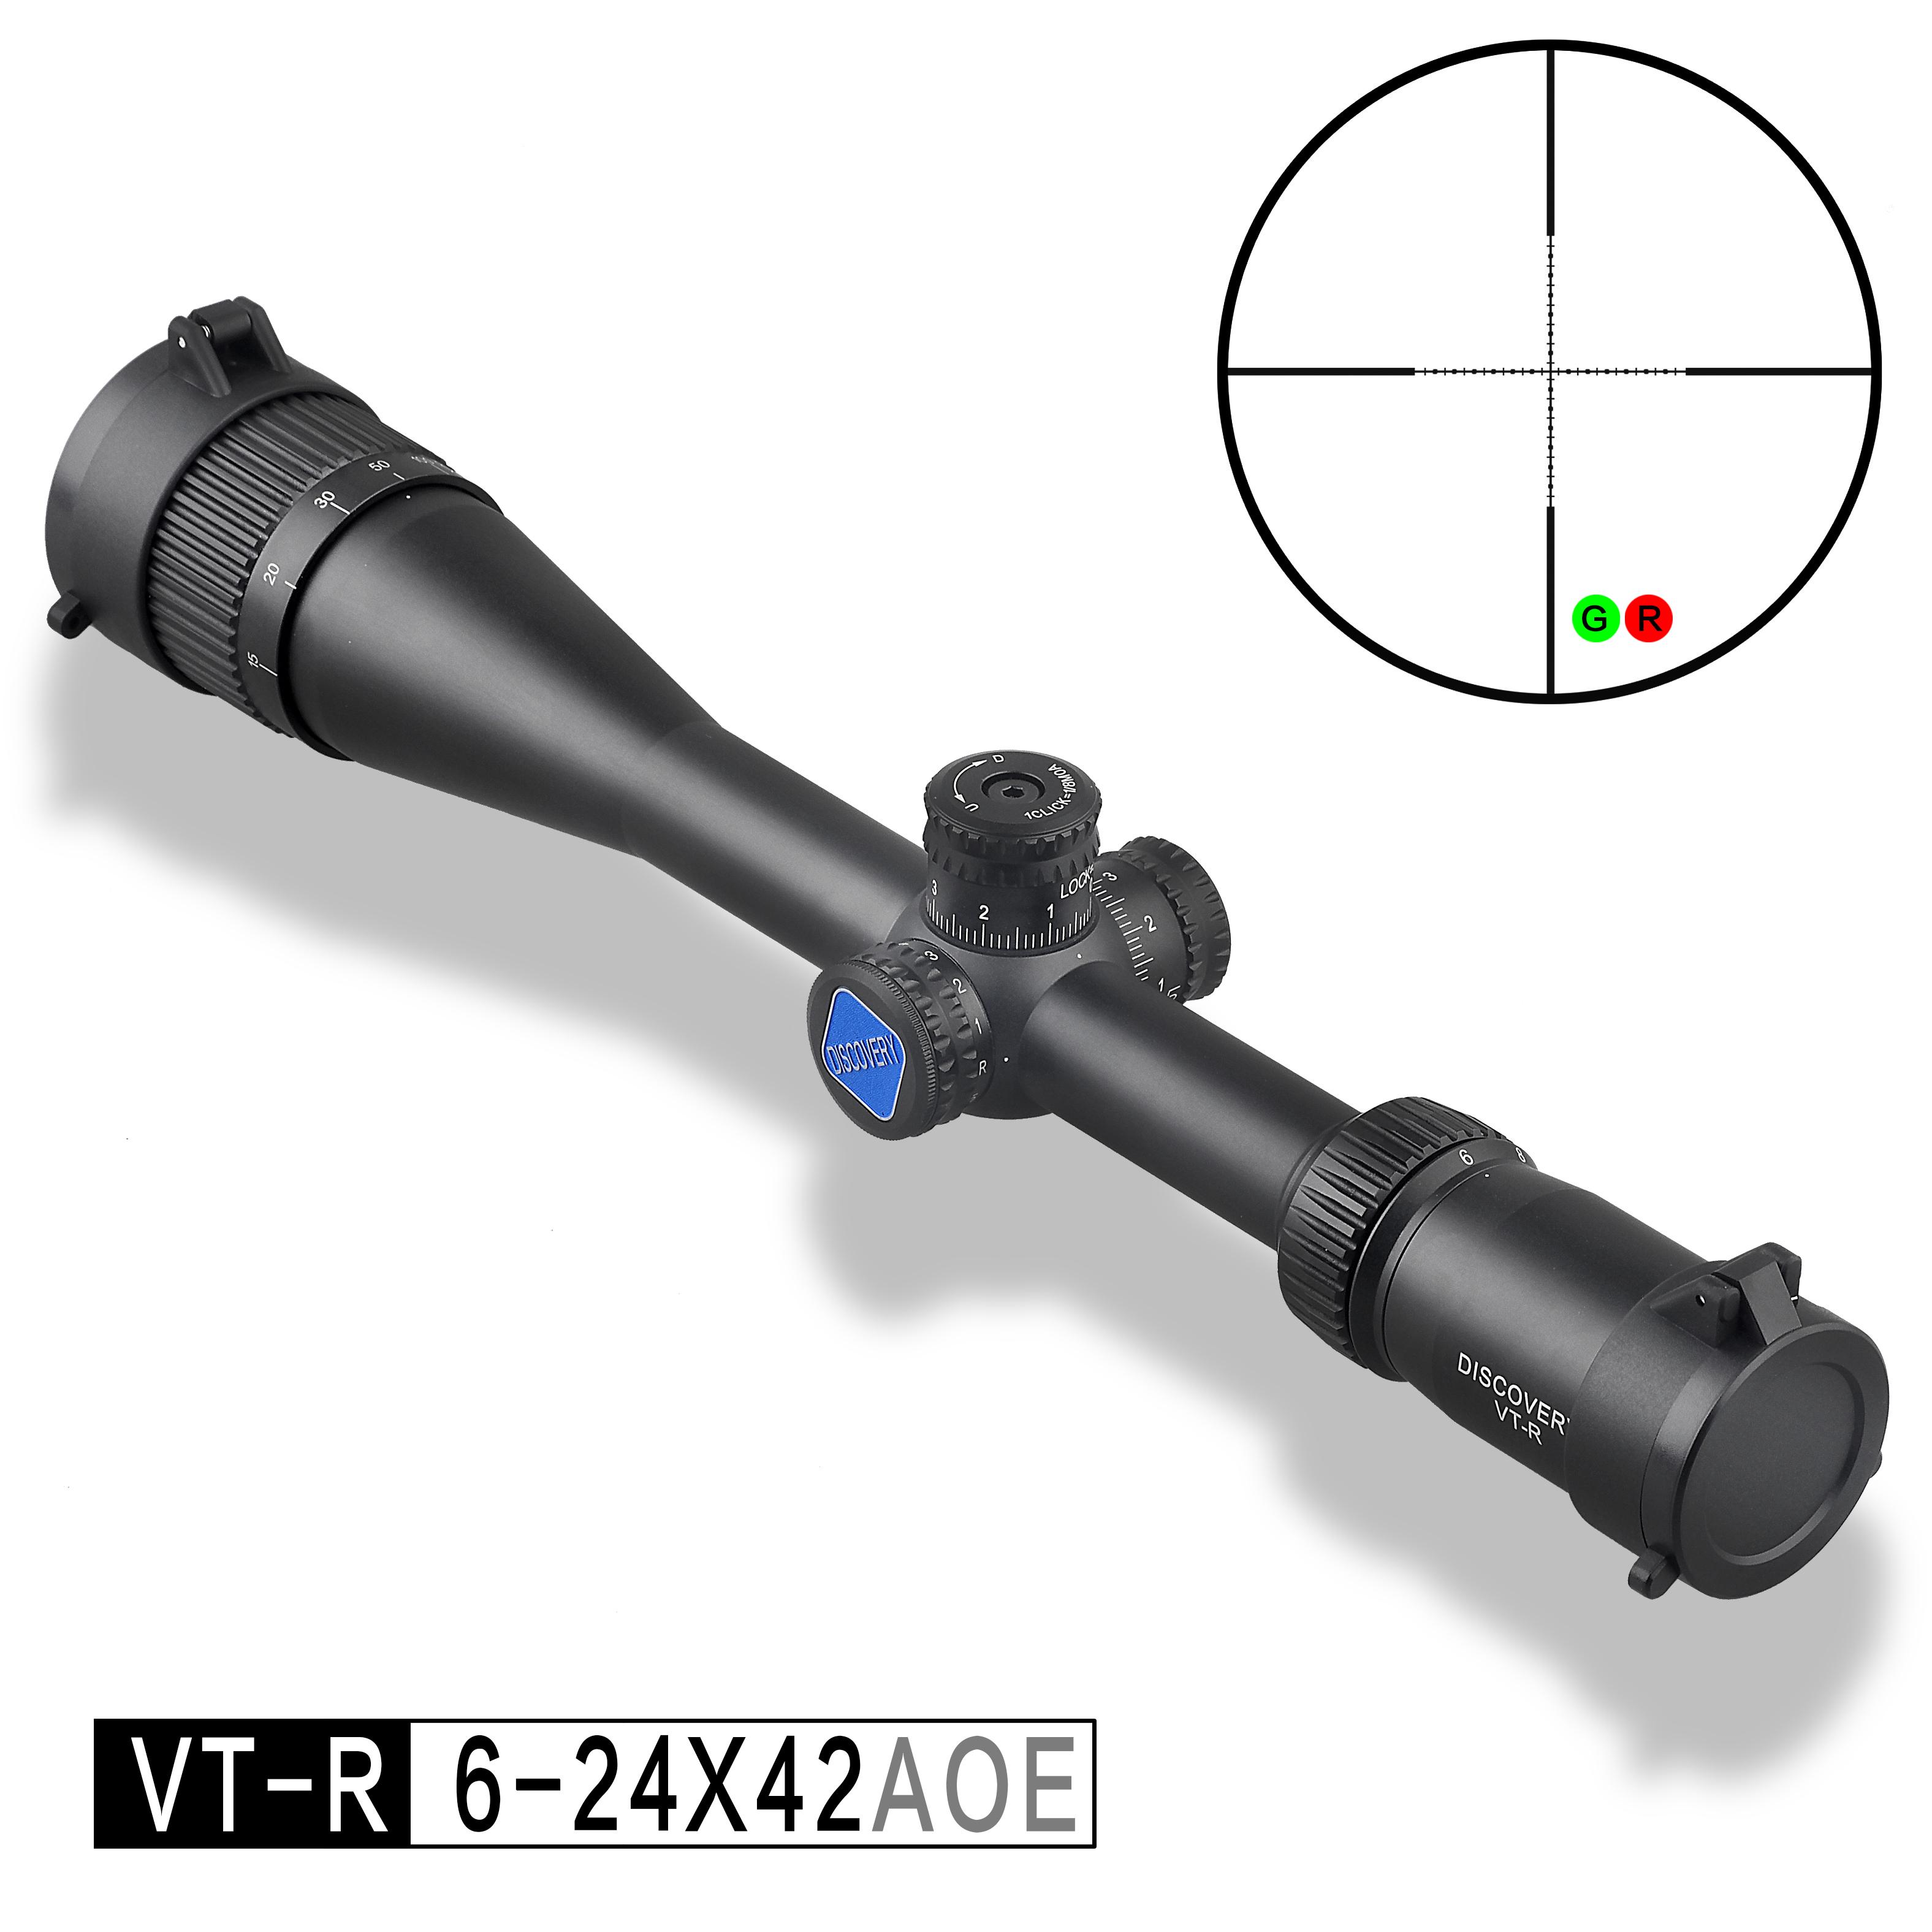 DISCOVERY VT-R 6-24x42AOE Zero Lock Shock Proof Hunting Rifle Scope Sight